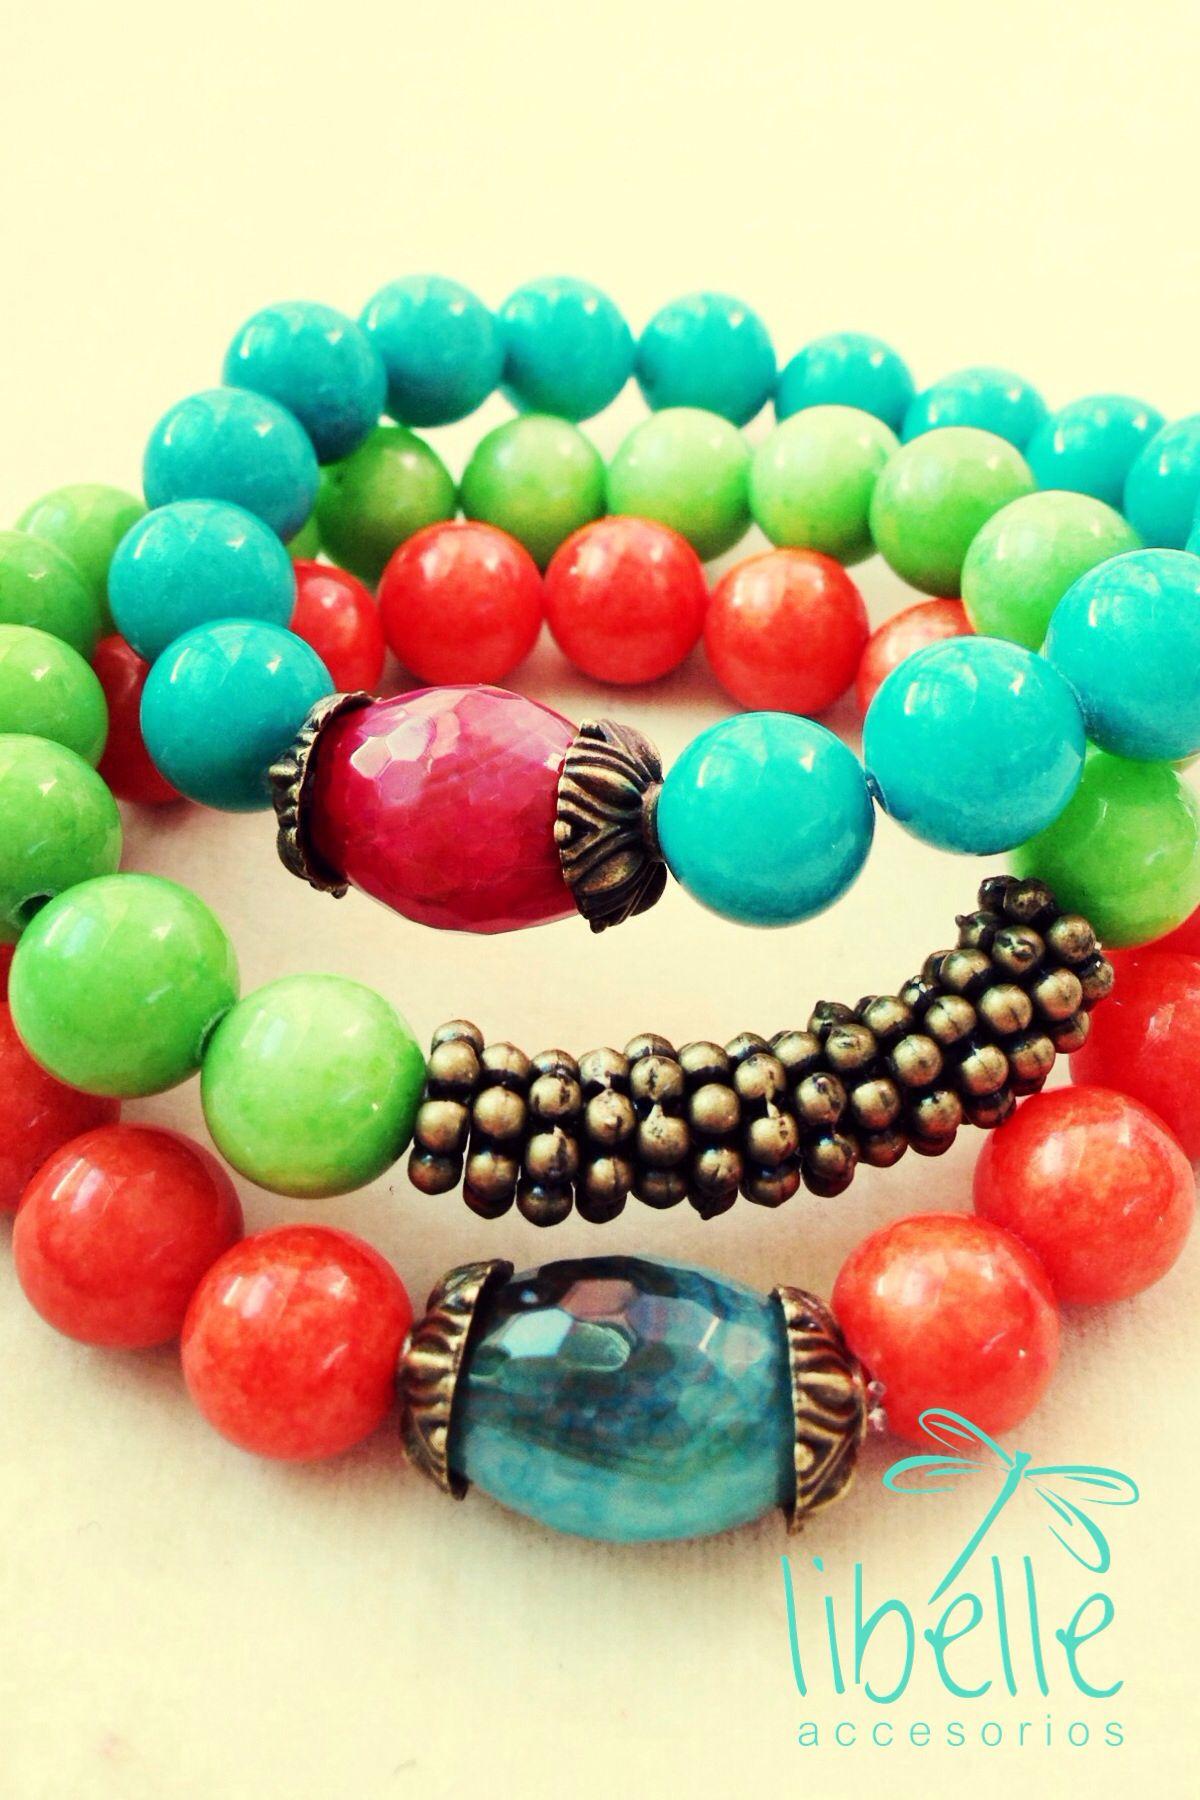 Handmade Jewelry Jewelry Ideas Colores